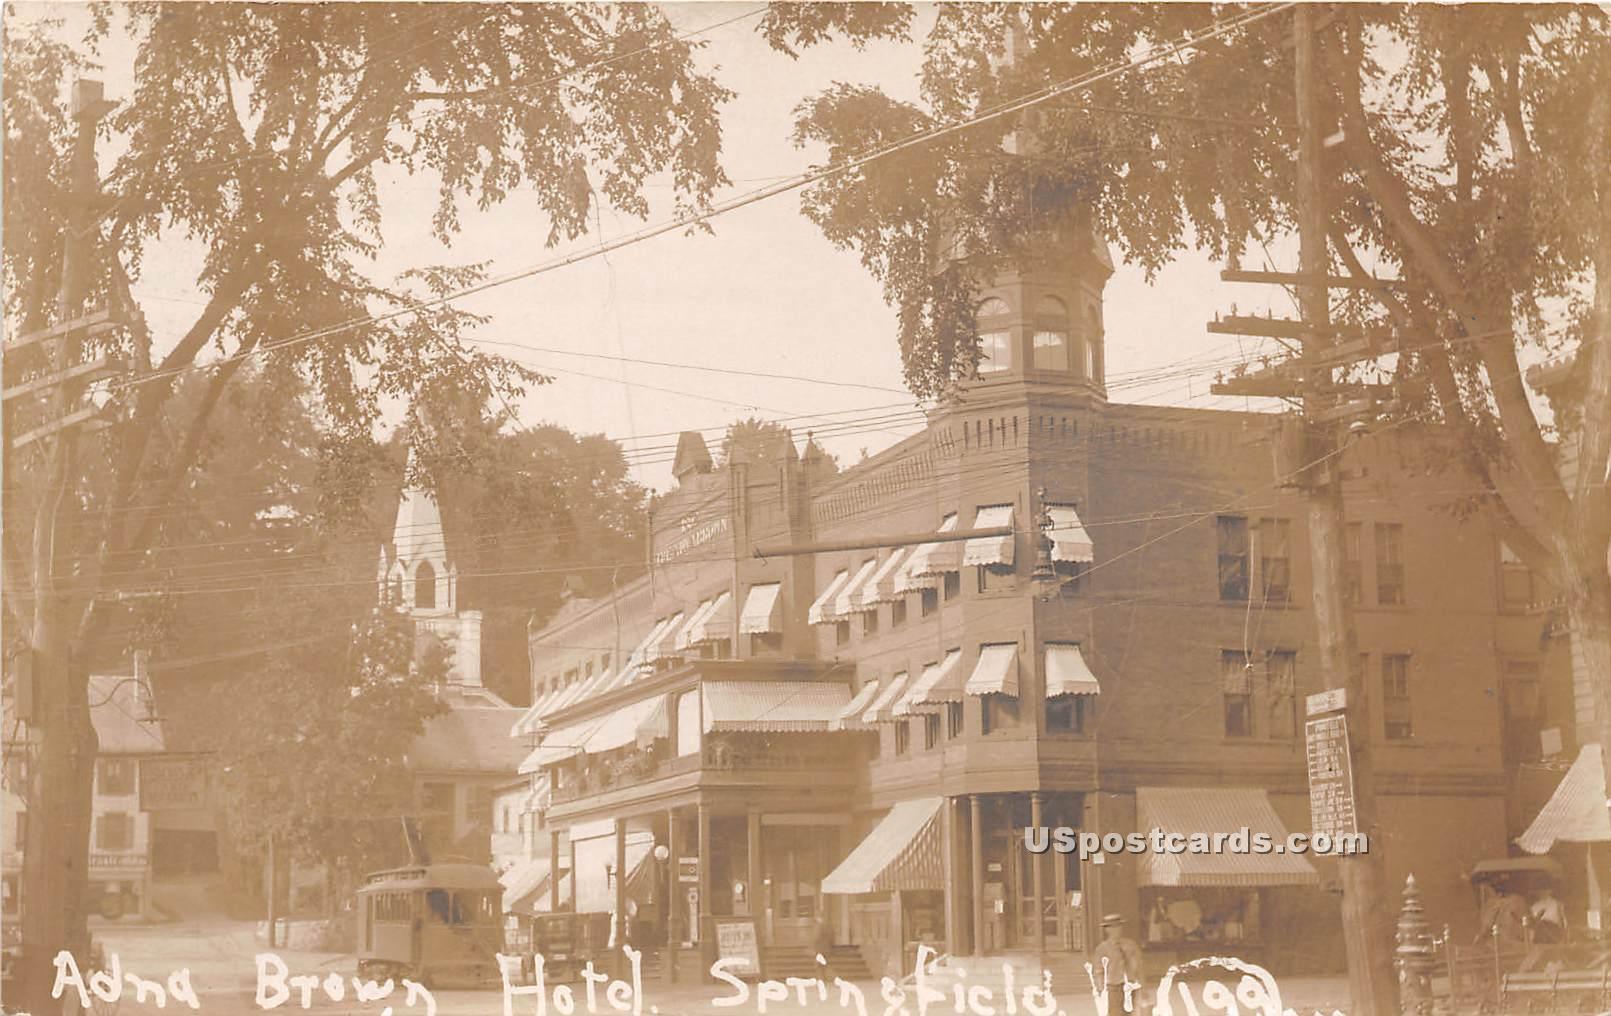 Adna Brown Hotel - Springfield, Vermont VT Postcard